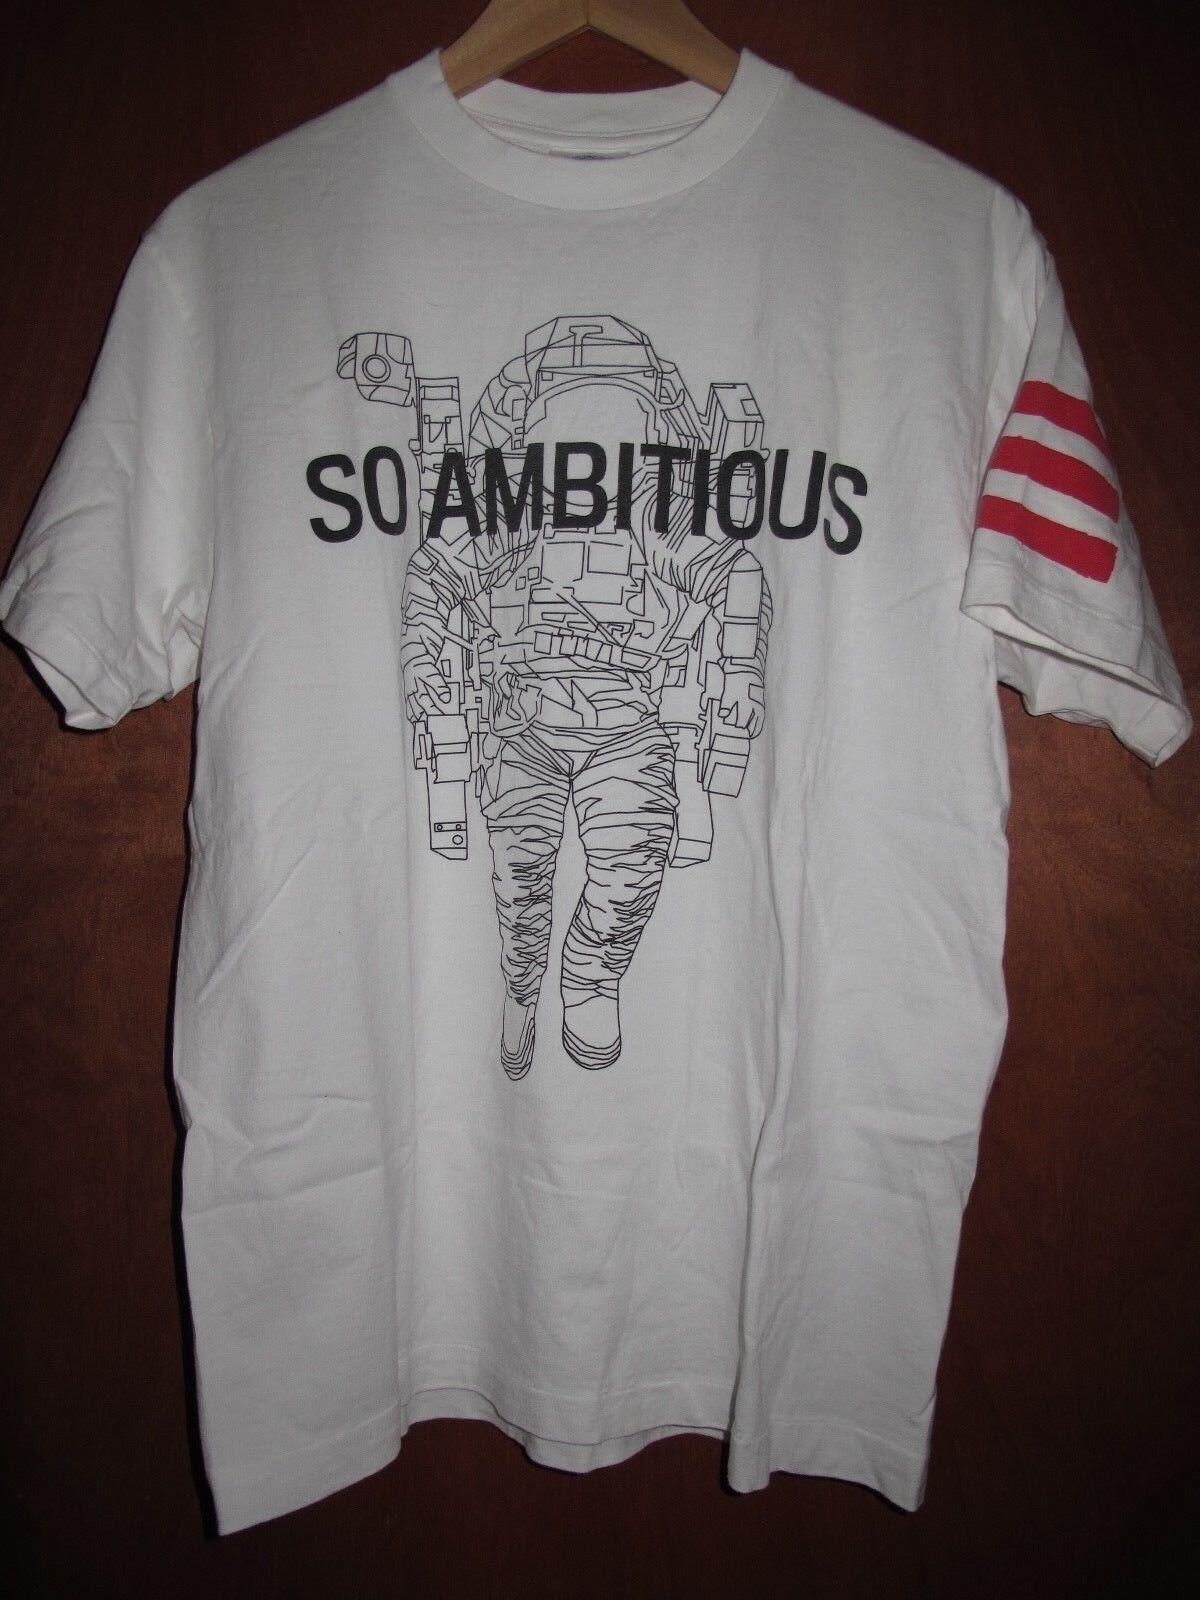 RARE BBC Billionaire Boys Club So Ambitious T-Shirt Blauprint 3 Jay-Z Größe M